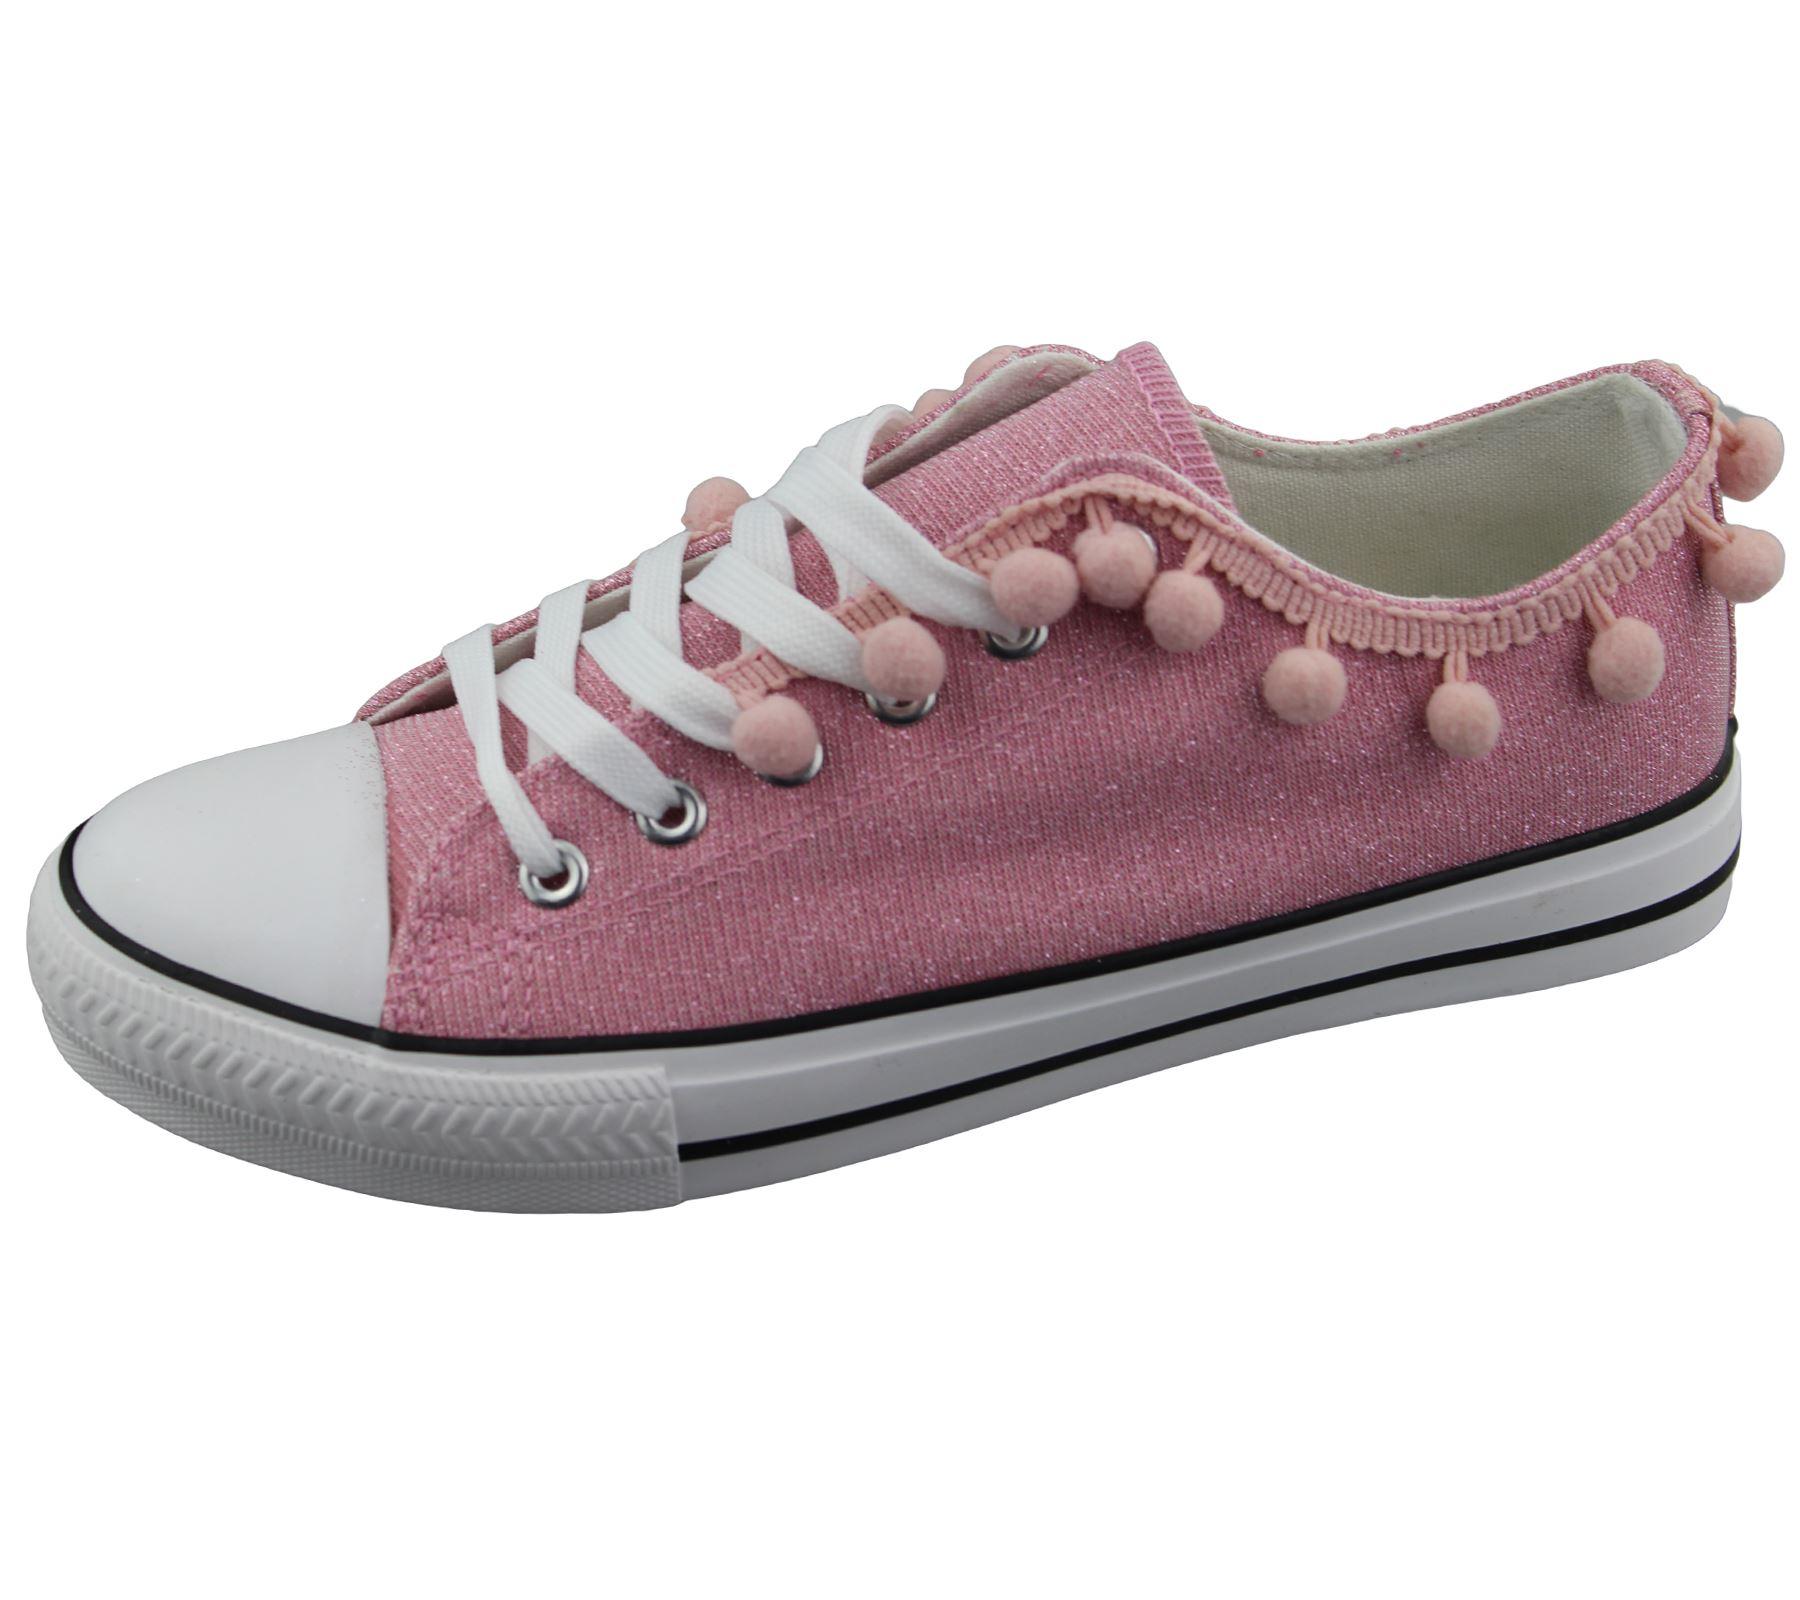 womens sneakers flat pumps glittered summer